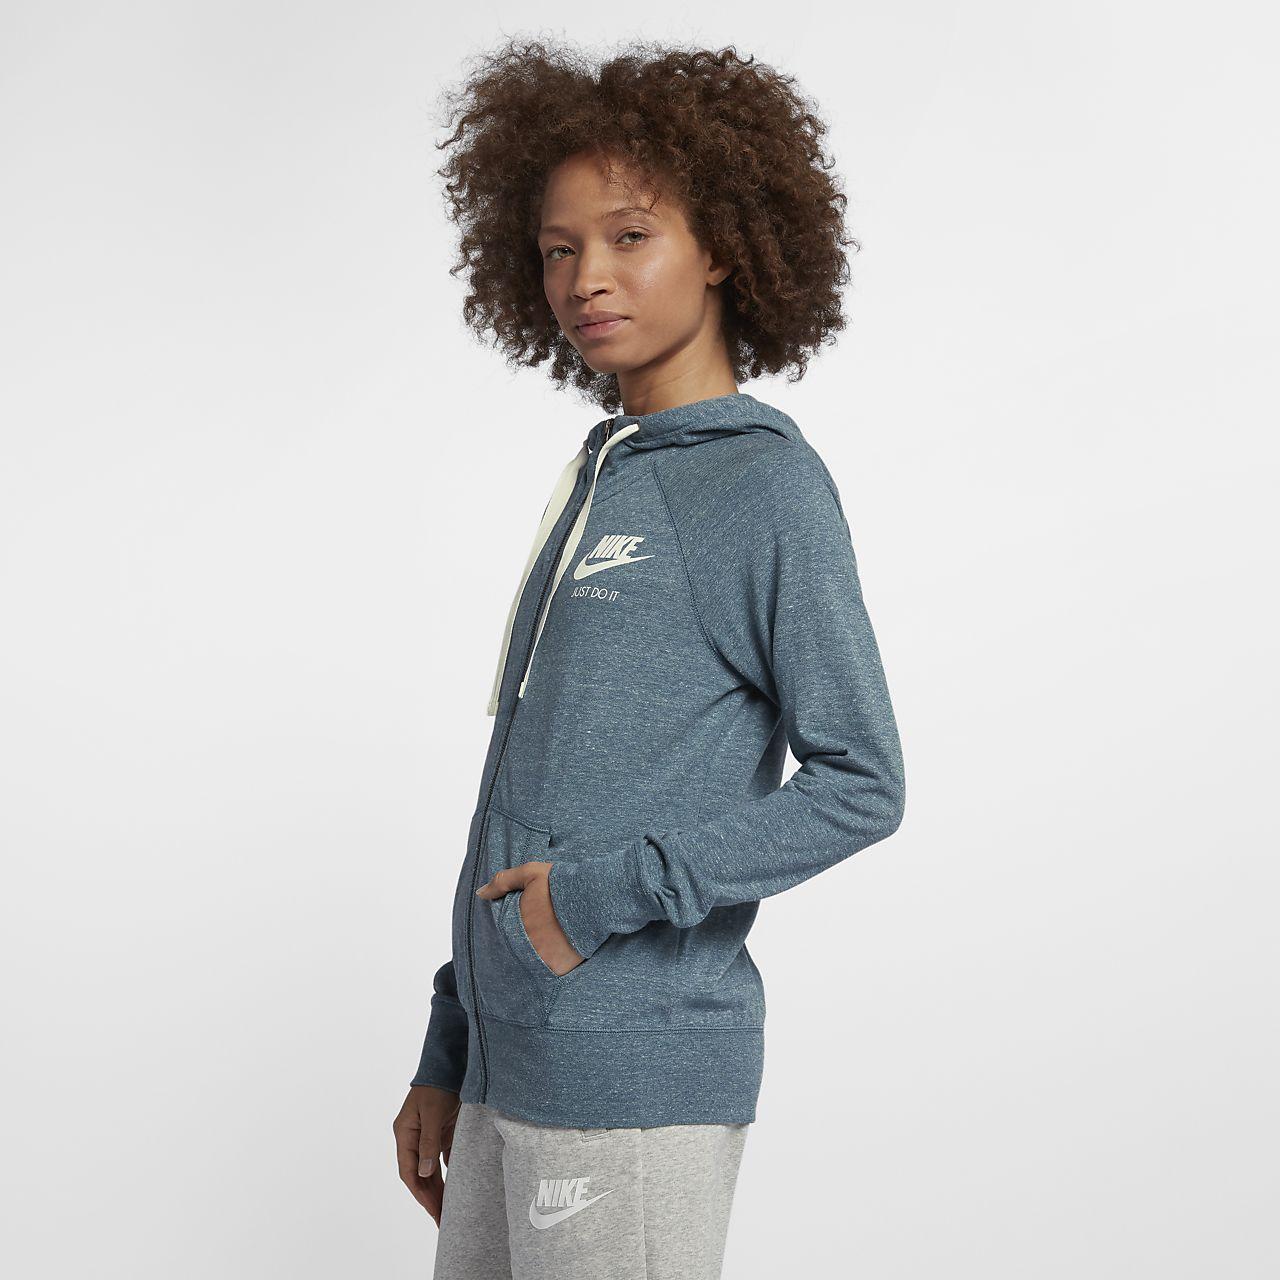 4b493dd875d Nike Sportswear Gym Vintage Women s Full-Zip Hoodie. Nike.com